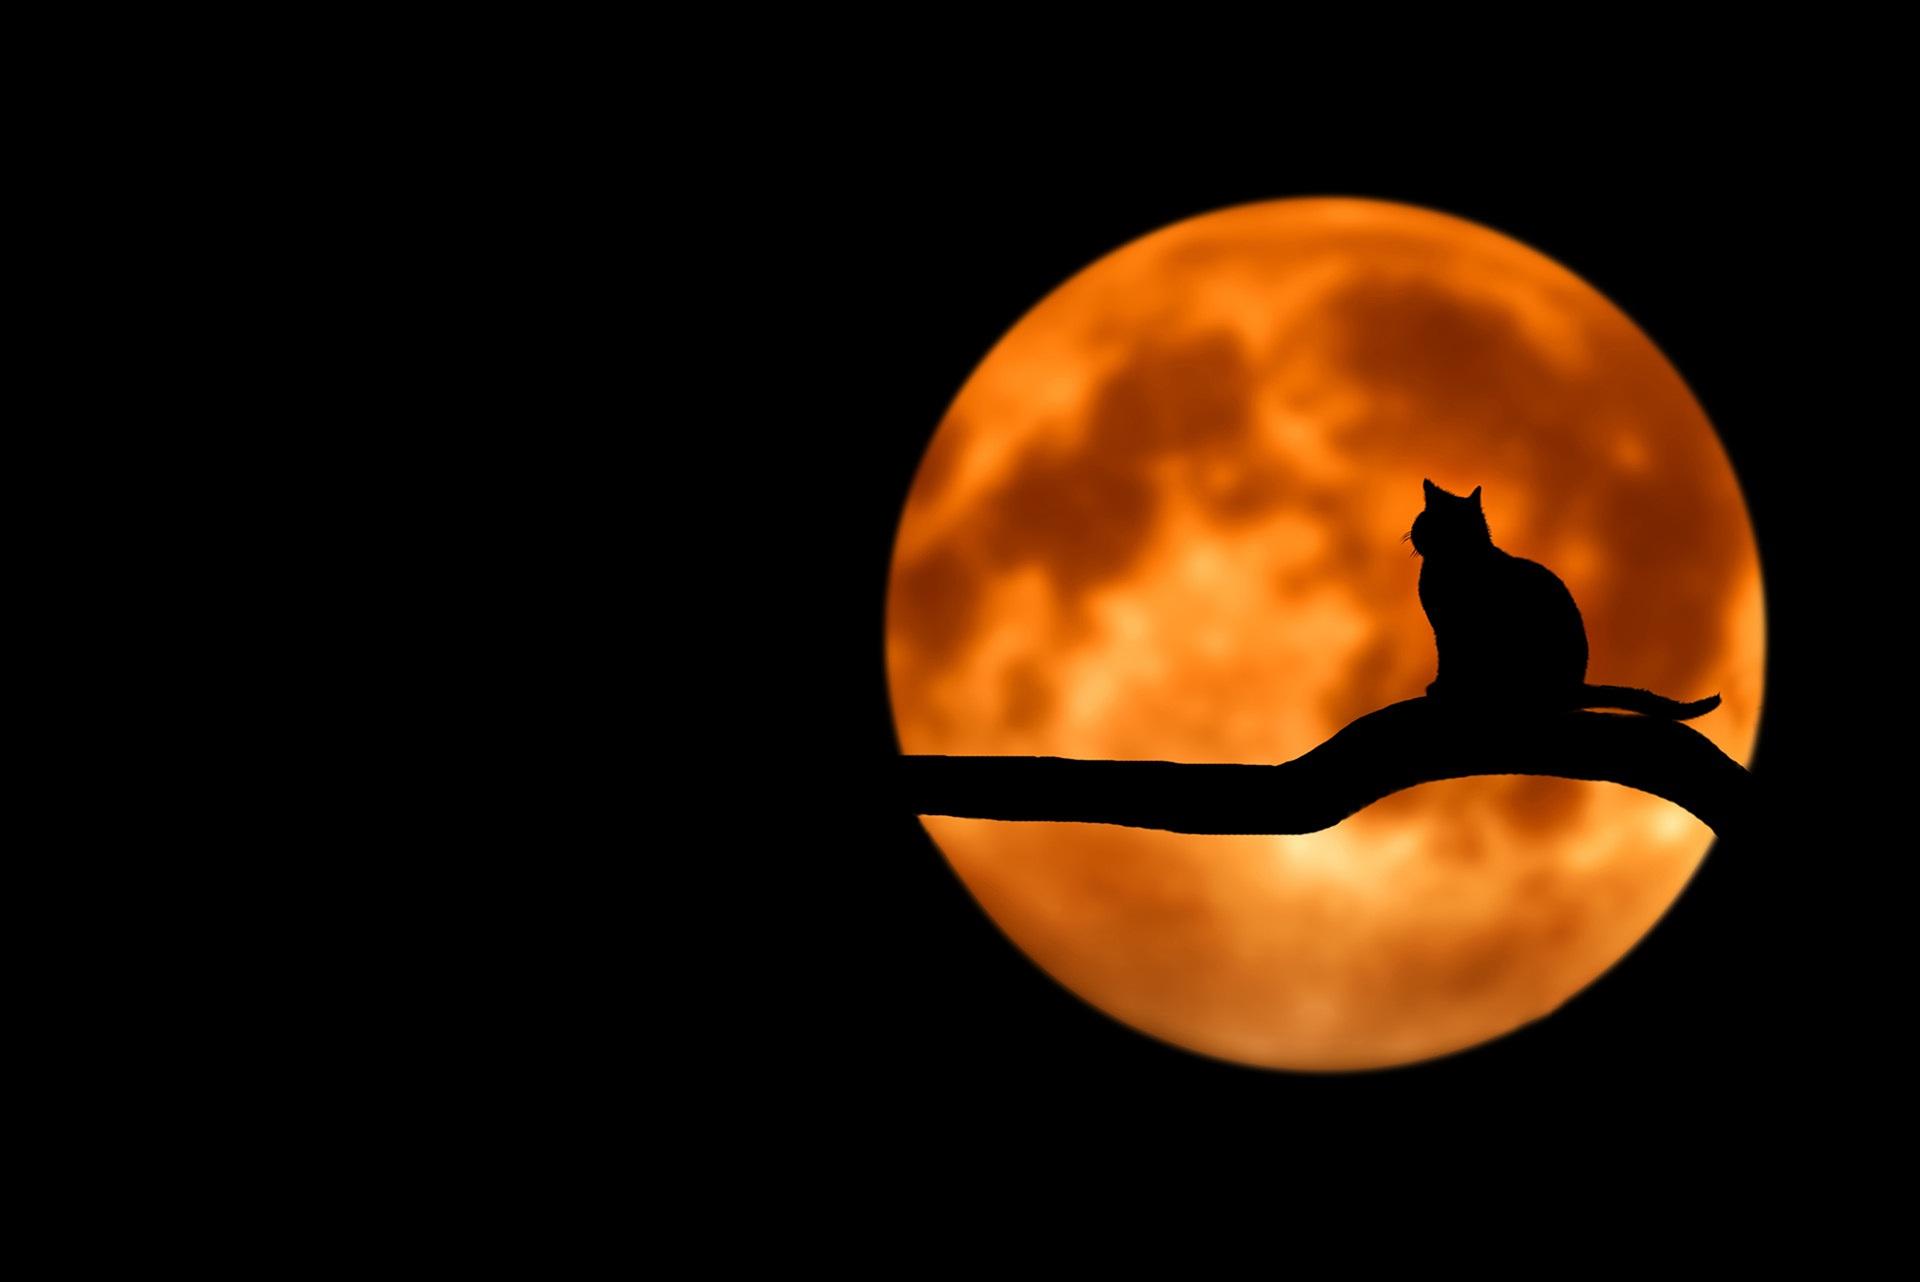 Black cat1.jpg